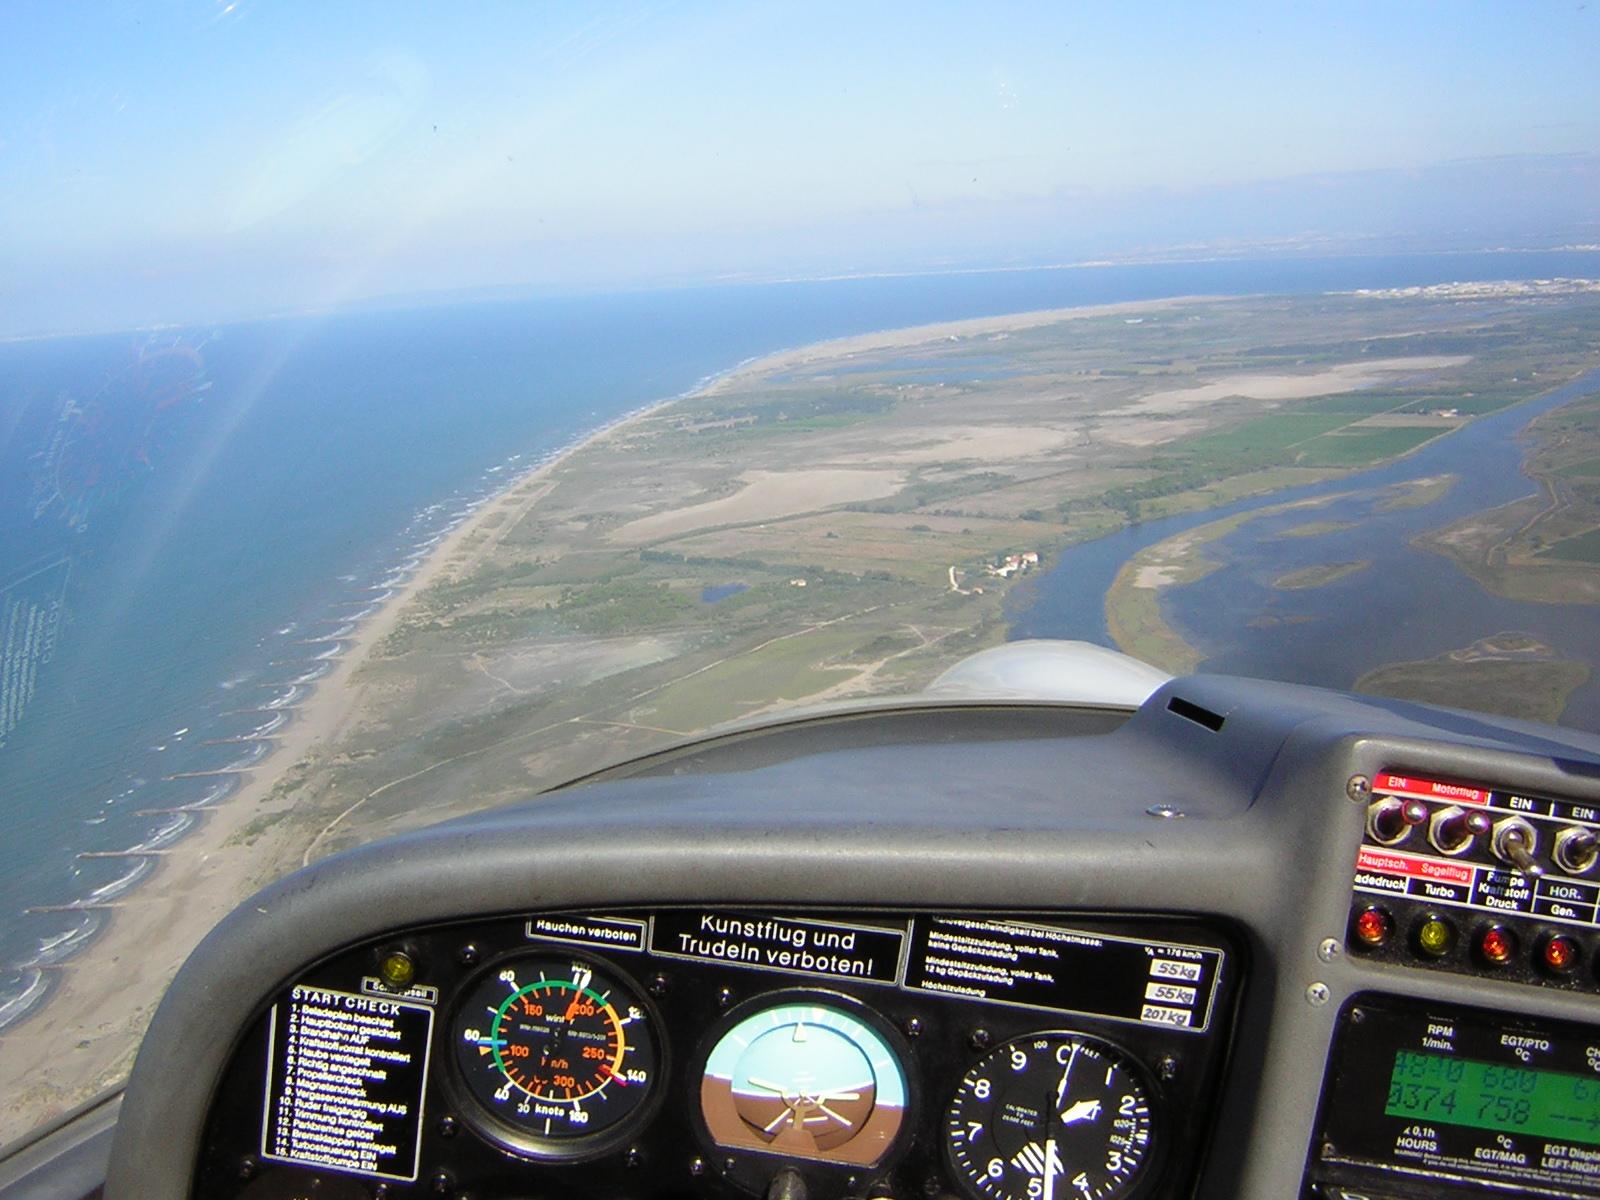 Flying in France6